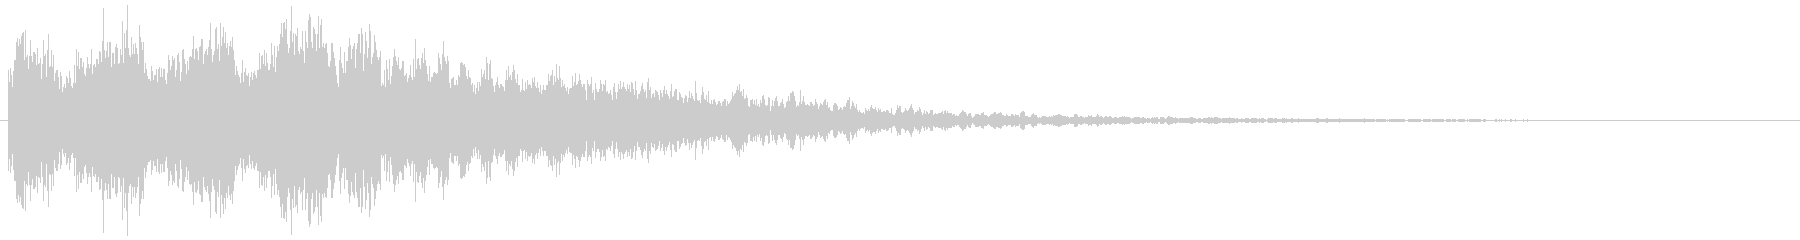 CINEMATIC BRAAMS_06の未再生の波形